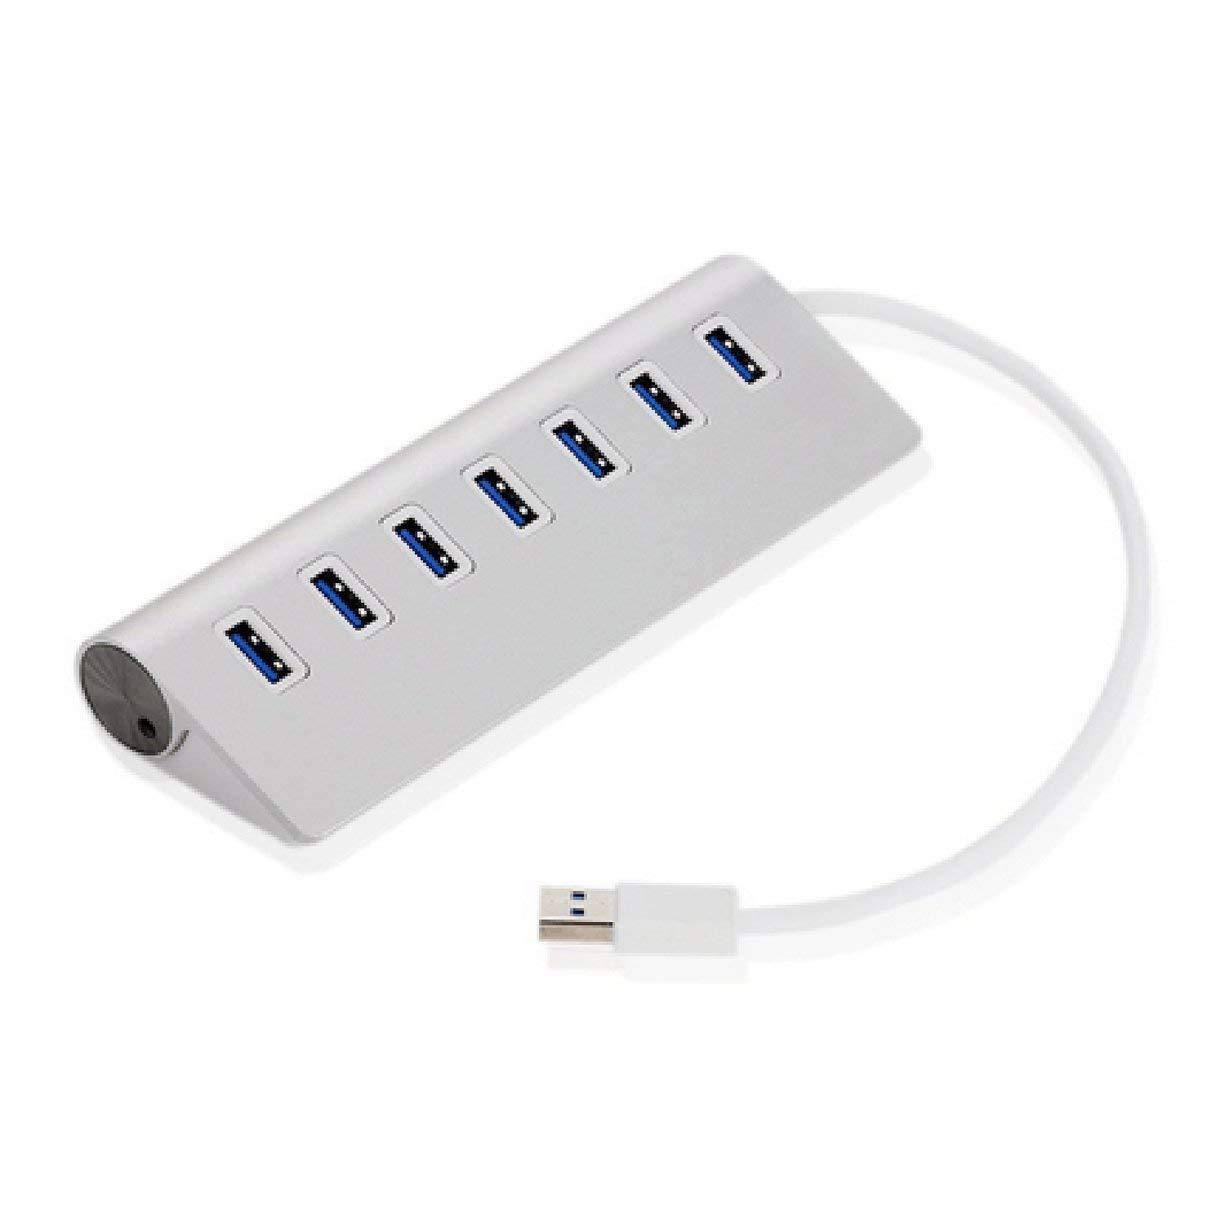 7 Ports USB 3.0 HUB Card Reader Connector Supports Hot Swap Aluminum Alloy Adapter Extender Splitter For Keyboard Computer